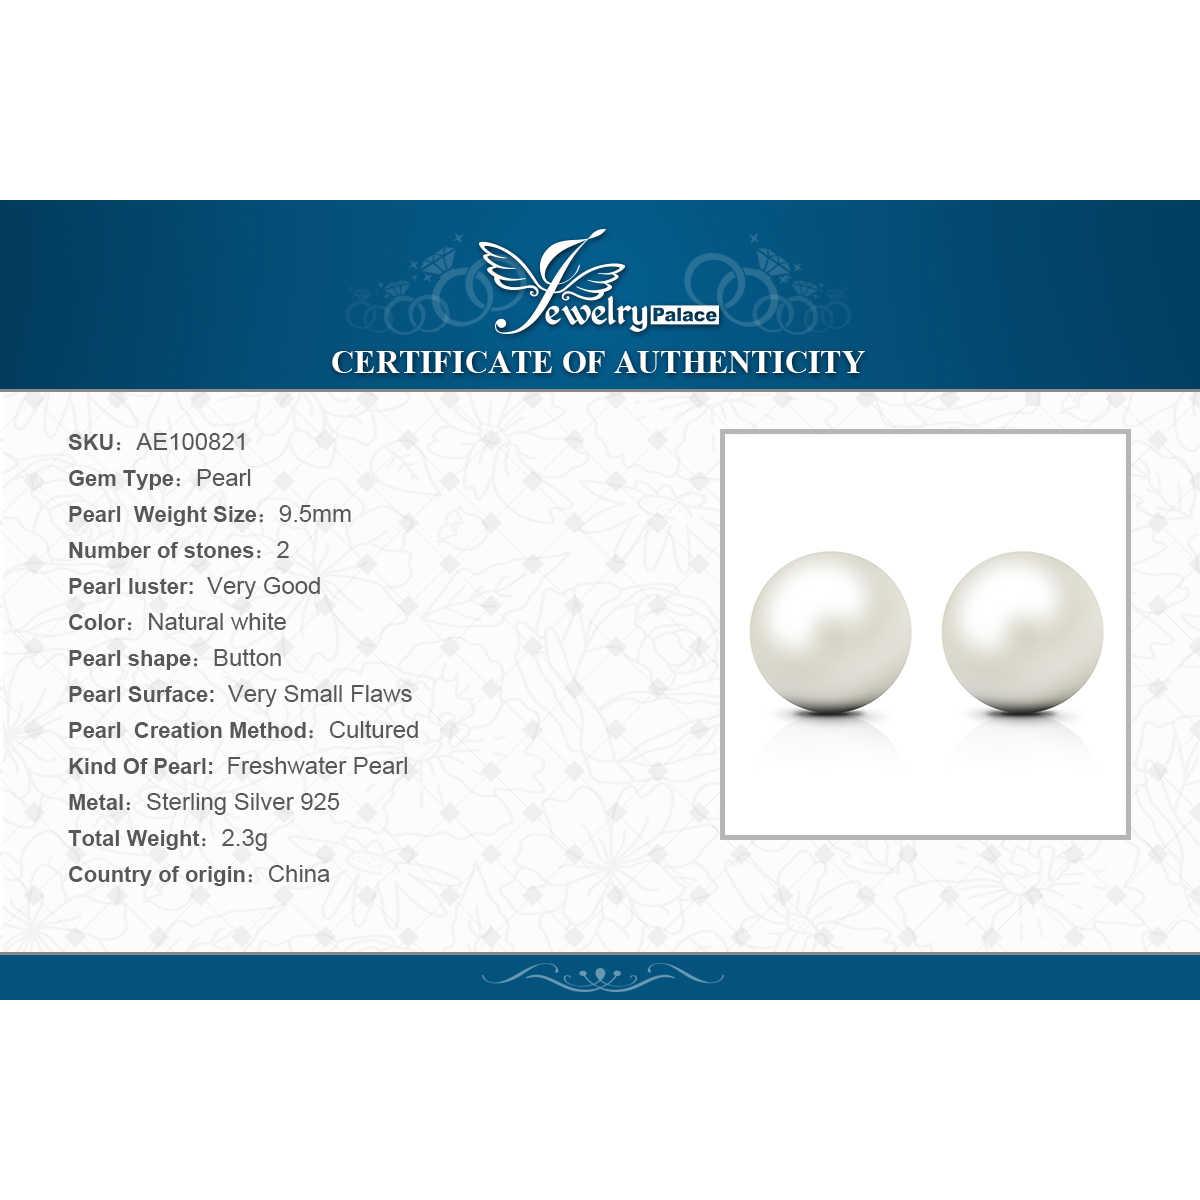 JewelryPalace 925 เงินสเตอร์ลิง 6.5 มม. ไข่มุกน้ำจืดต่างหูสำหรับผู้หญิง Best ของขวัญเครื่องประดับ